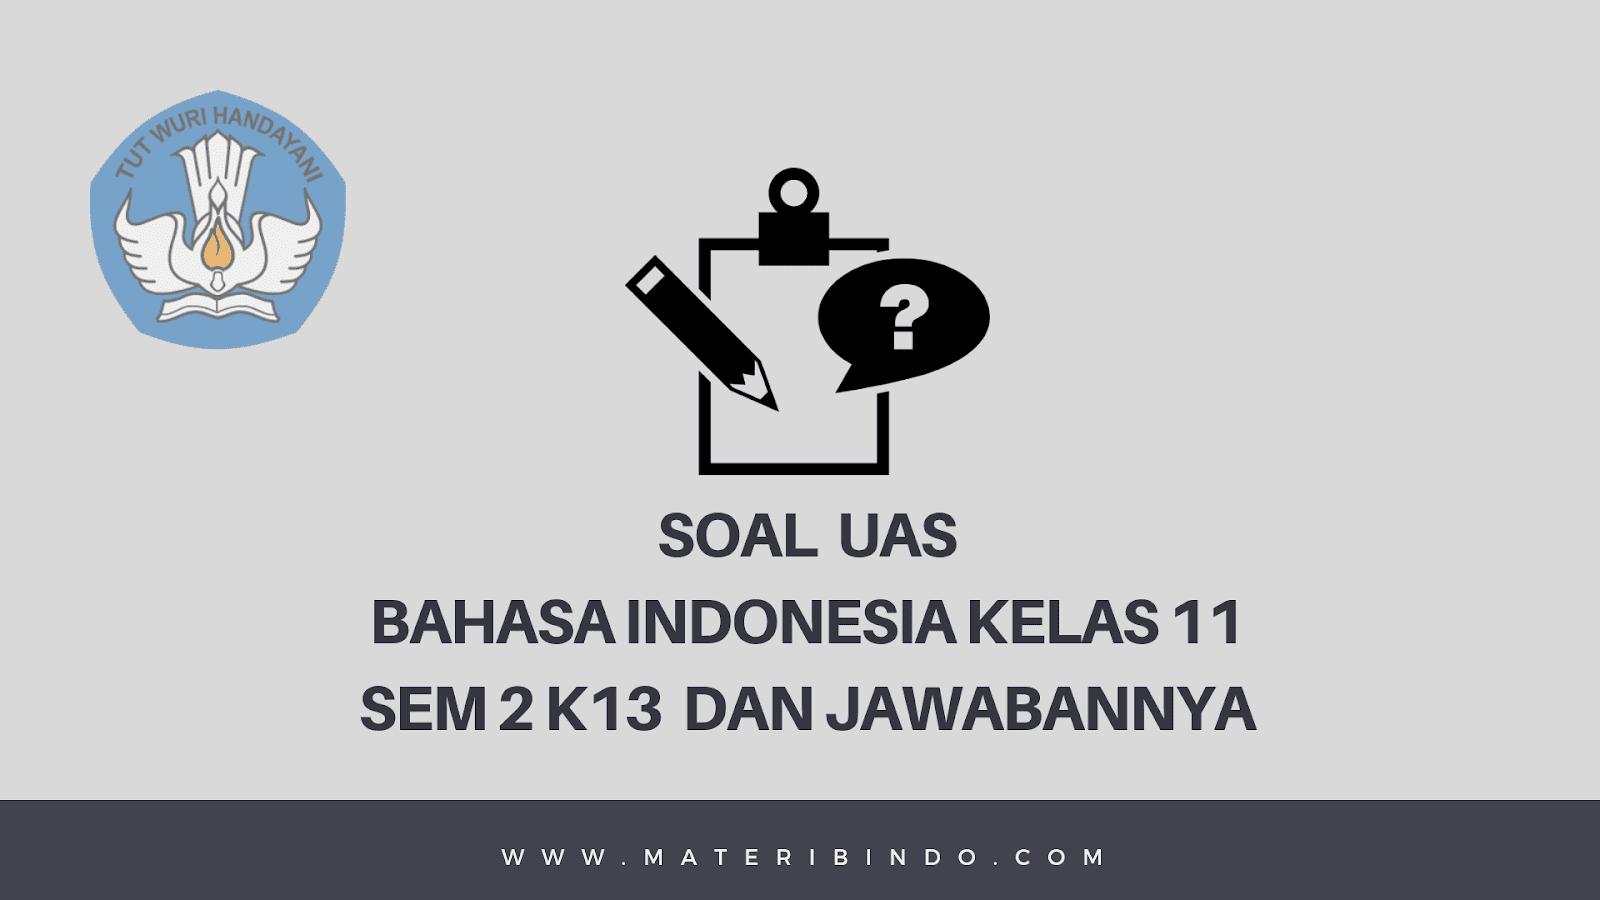 50 Contoh Soal Uas Bahasa Indonesia Kelas 11 Semester 2 K13